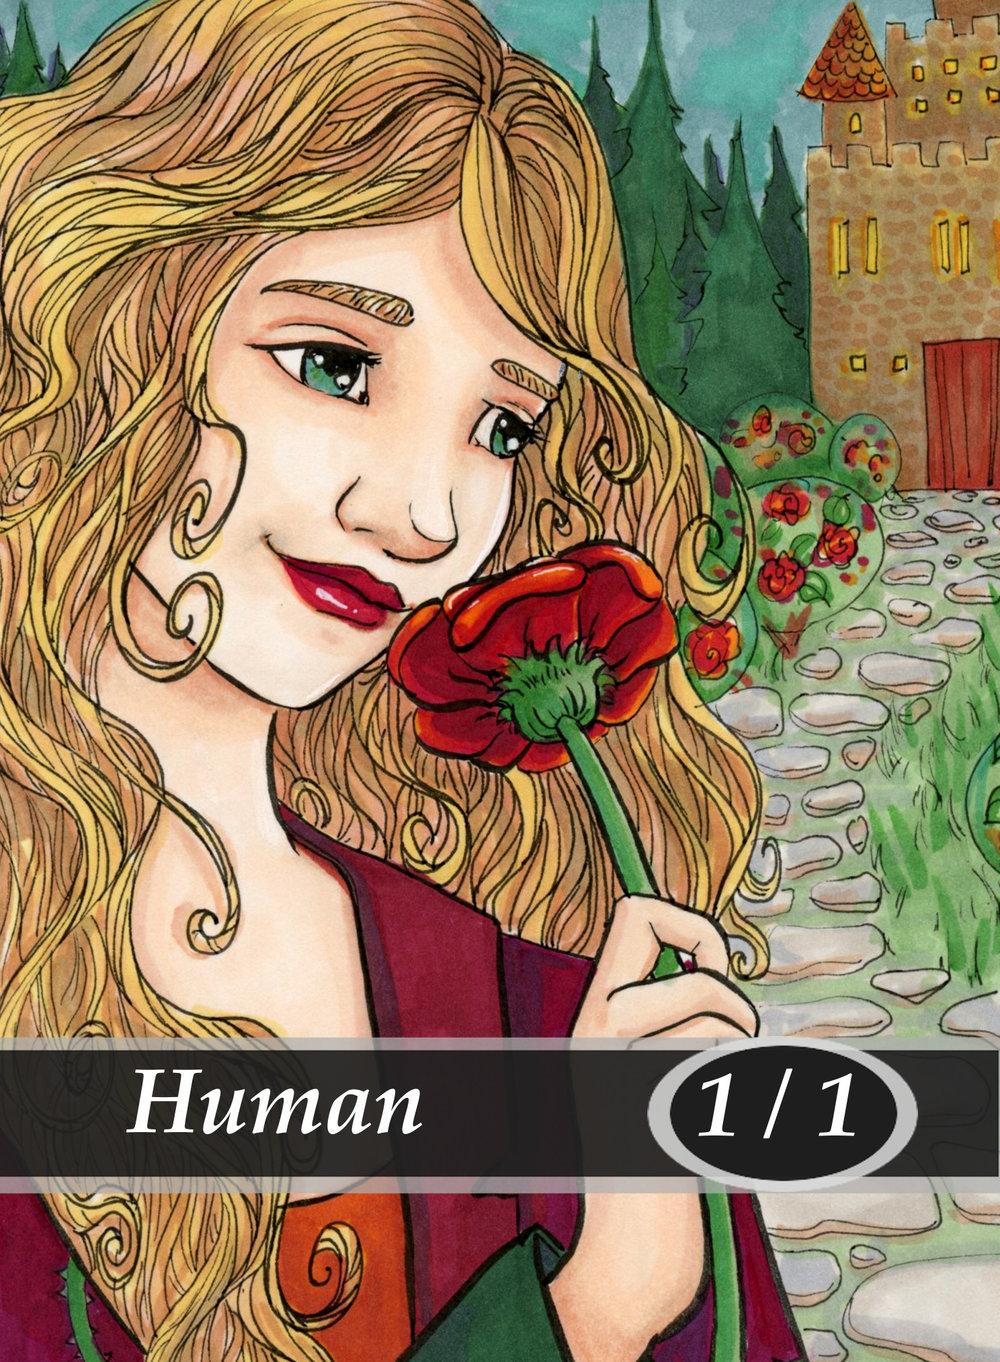 Human Magic the Gathering MTG Token by Anna Van Skike with AnnaVSart